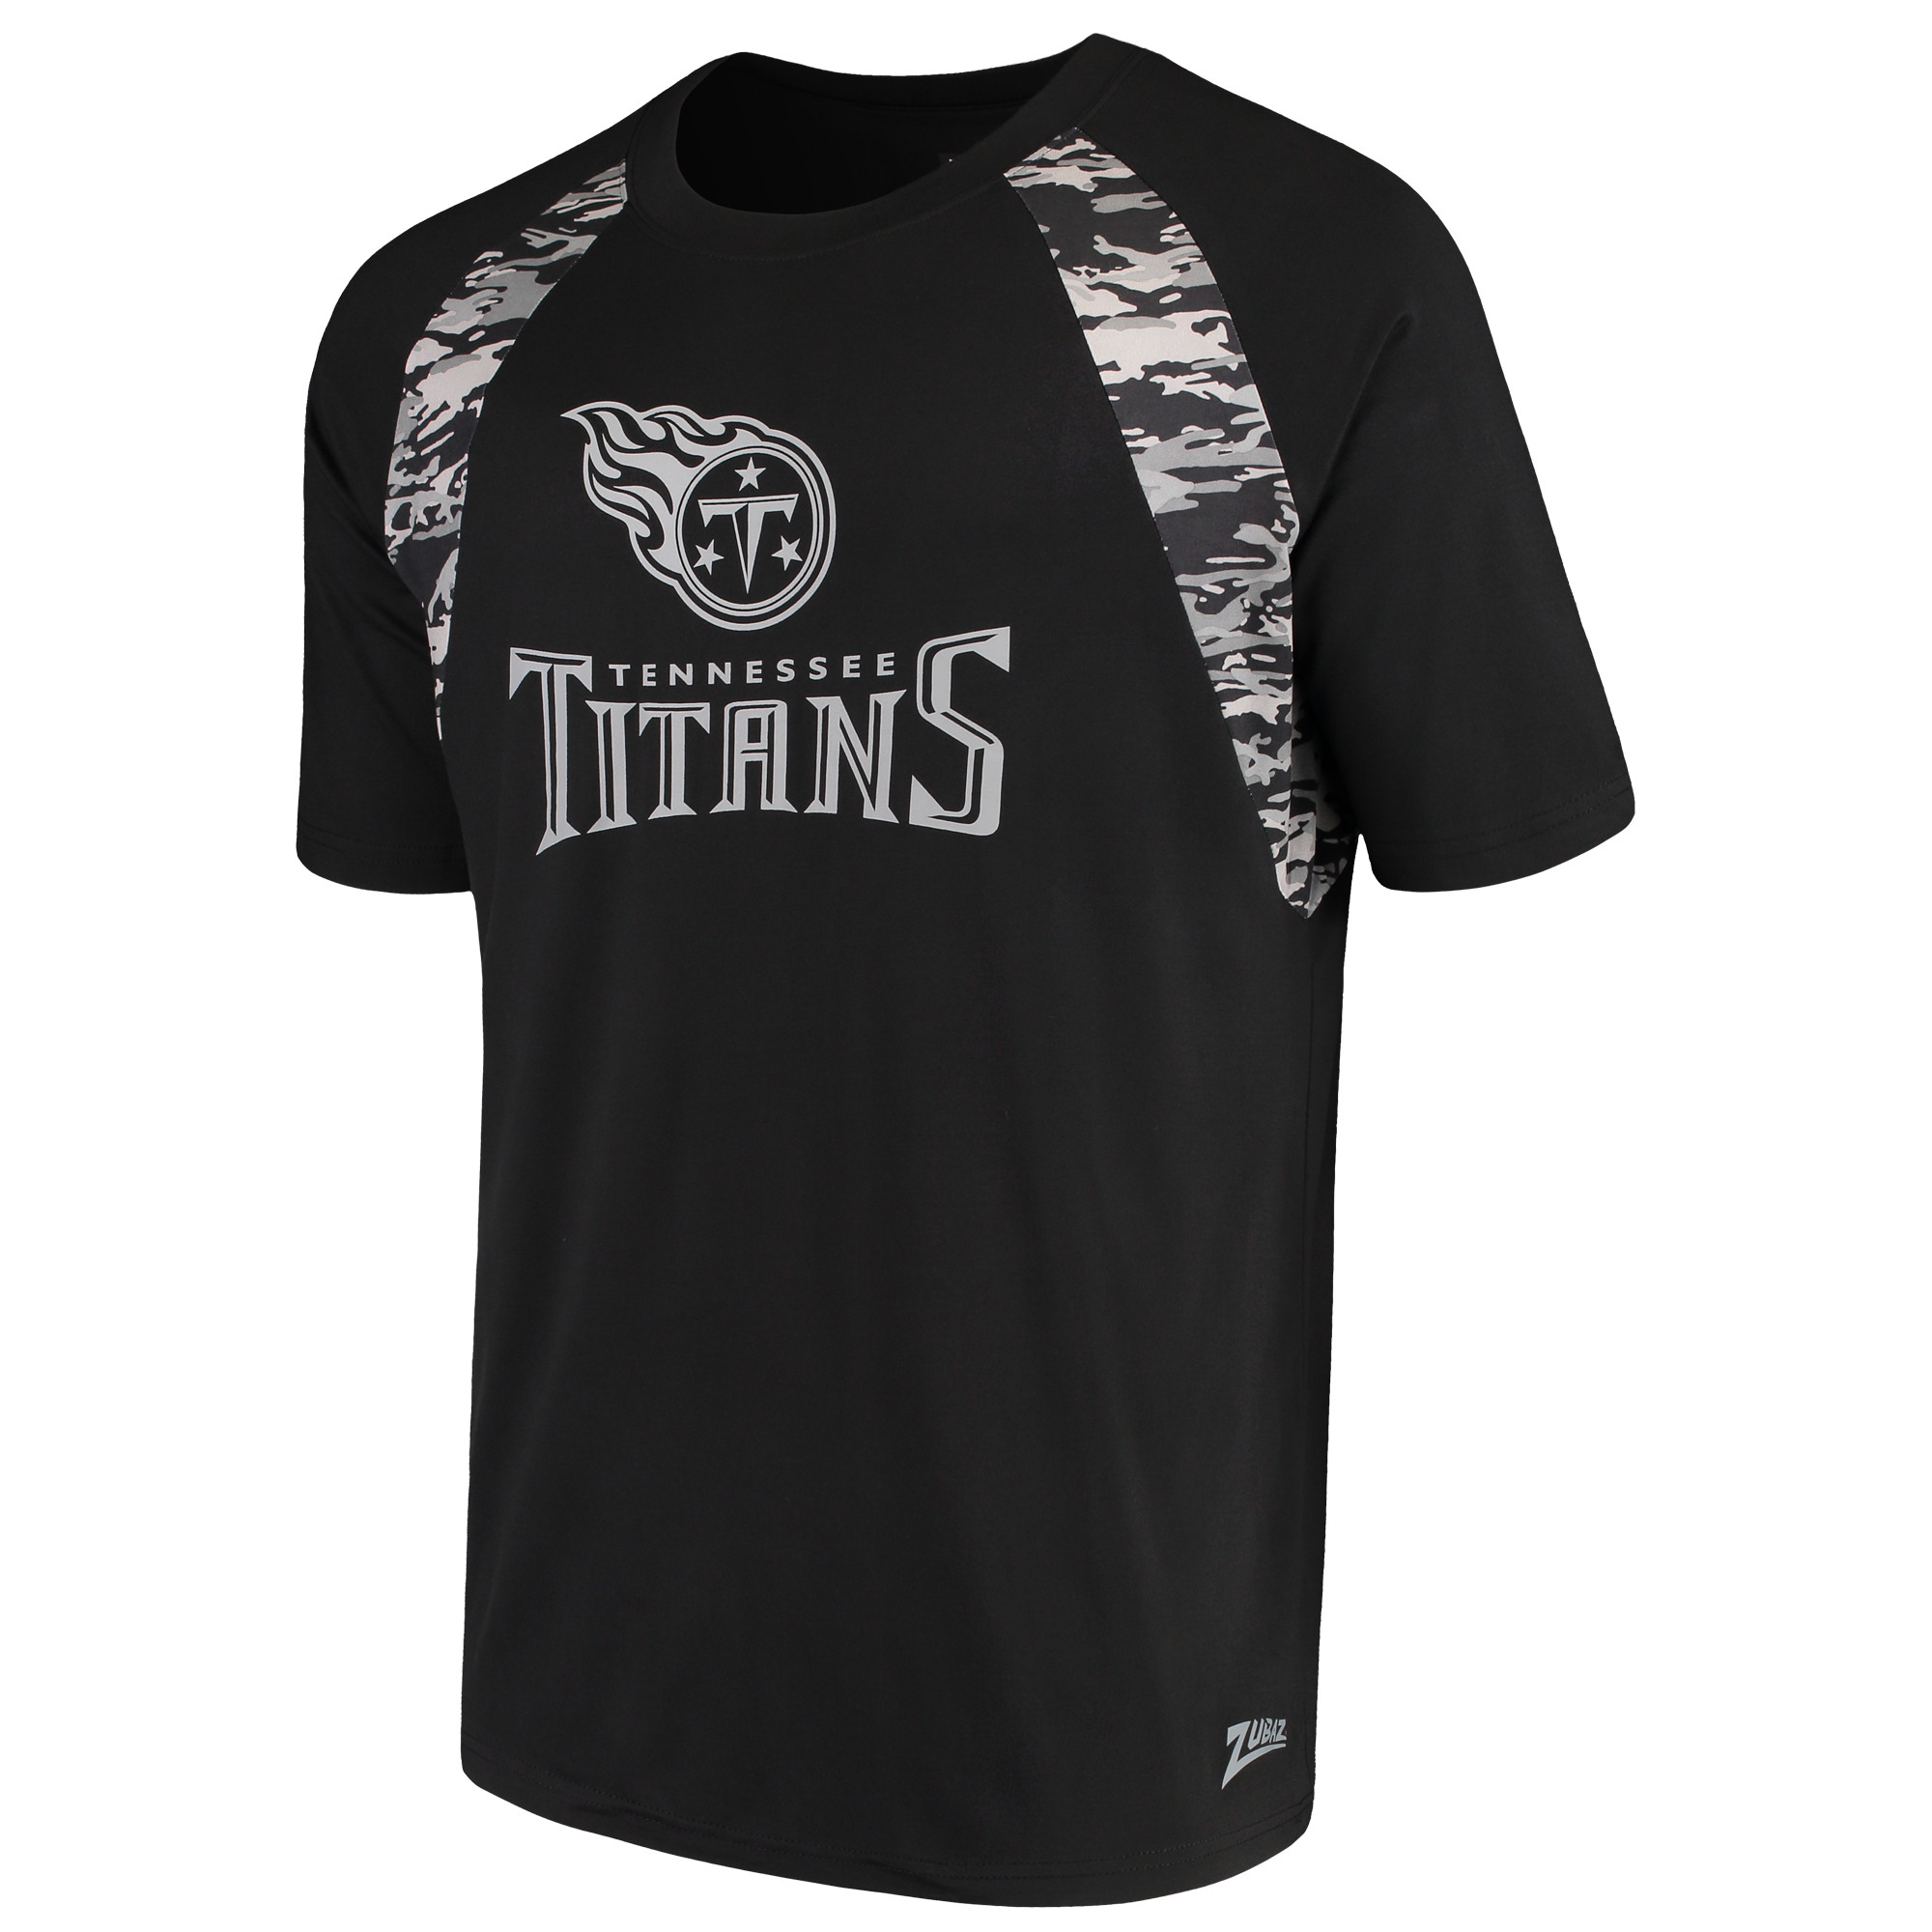 Men's Zubaz Black Tennessee Titans Camo Raglan T-Shirt